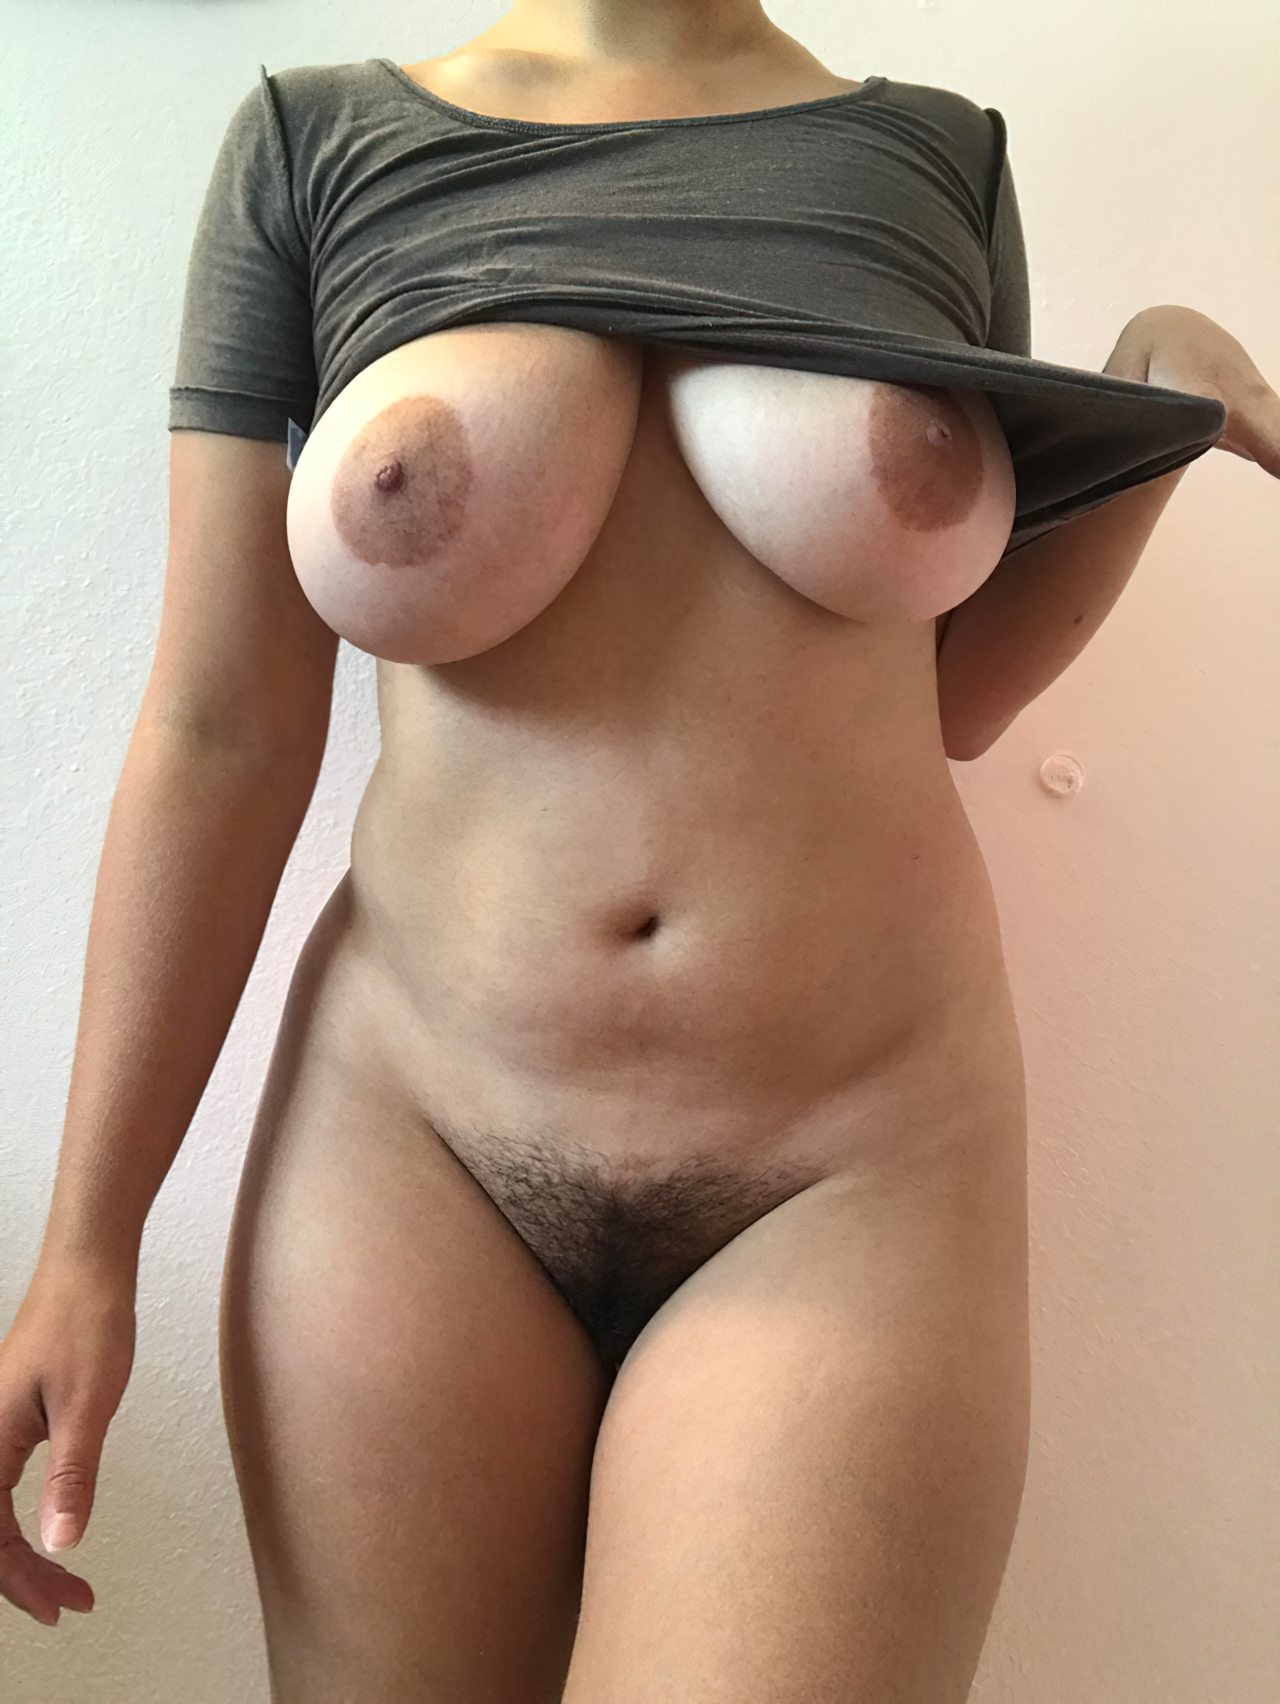 Fotos Mulheres Despidas (2)